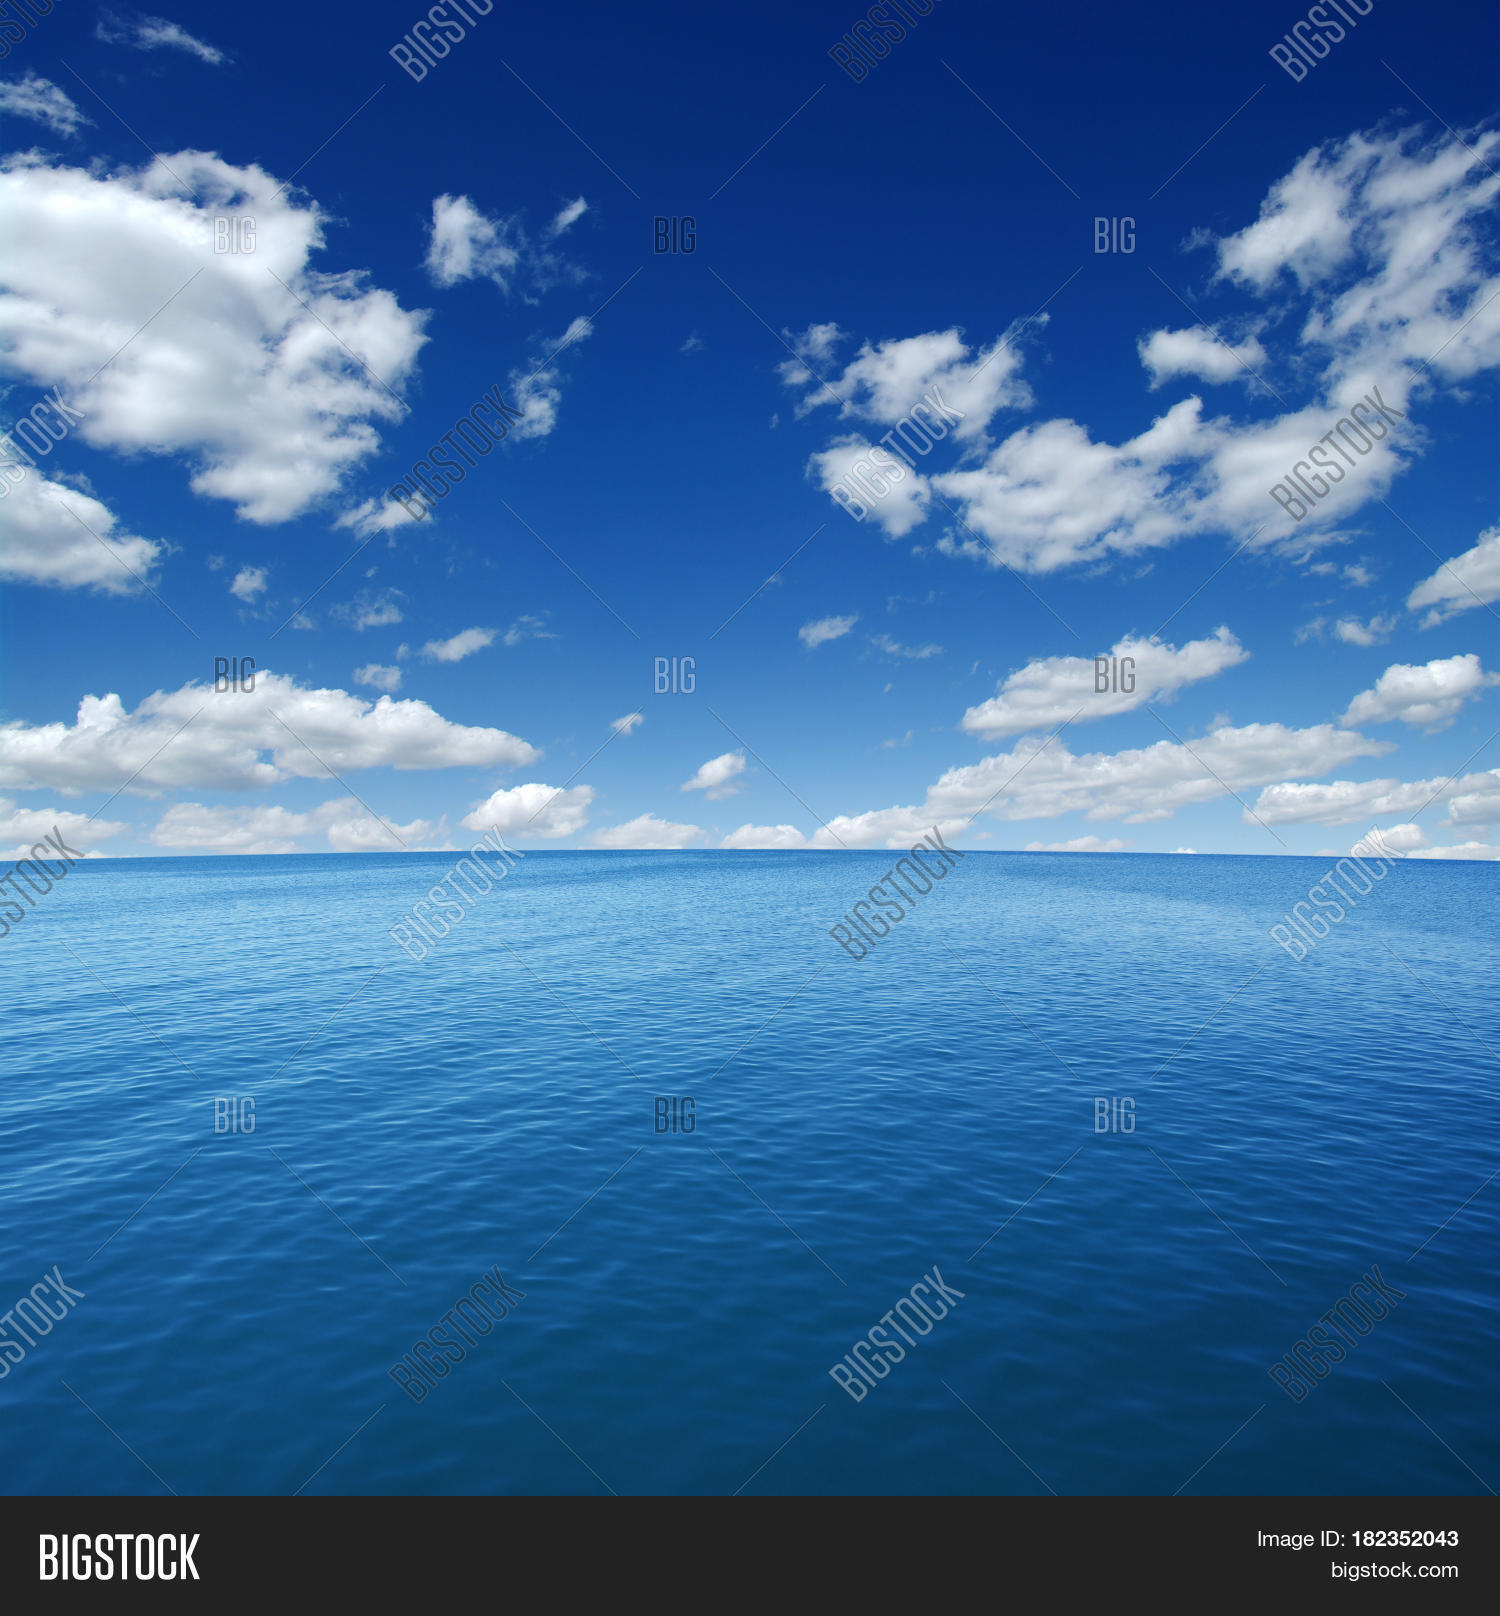 1366x768 blue sea surface - photo #28